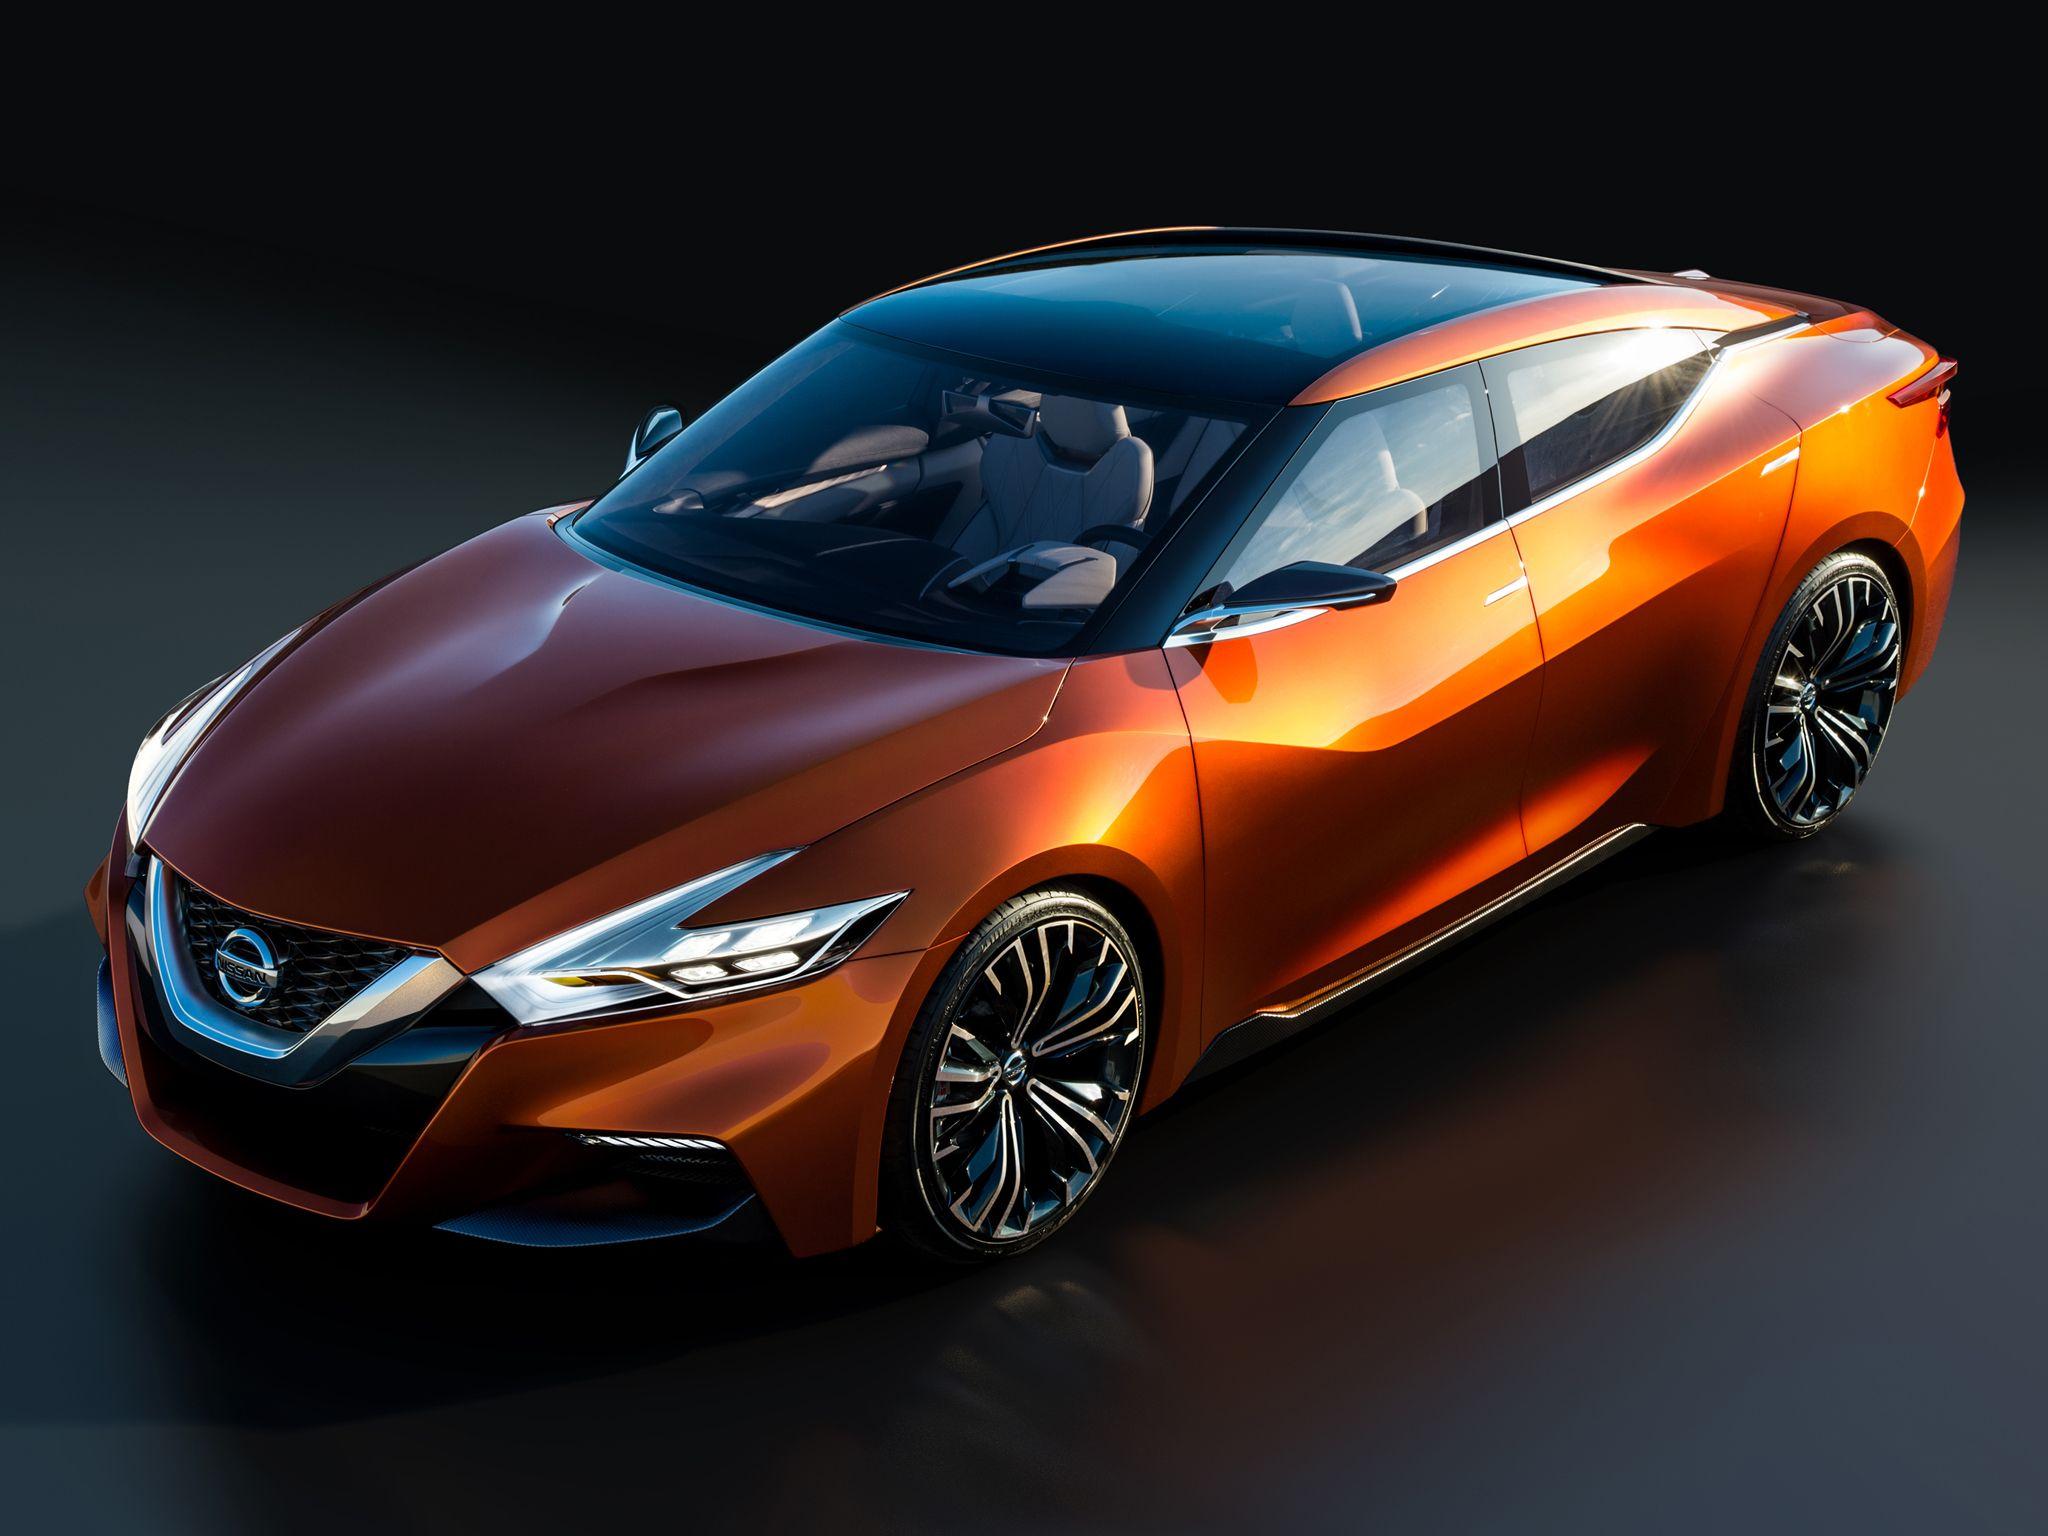 2014 Nissan Sport Sedan Concept Nissan Maxima Nissan Sports Cars Sports Sedan